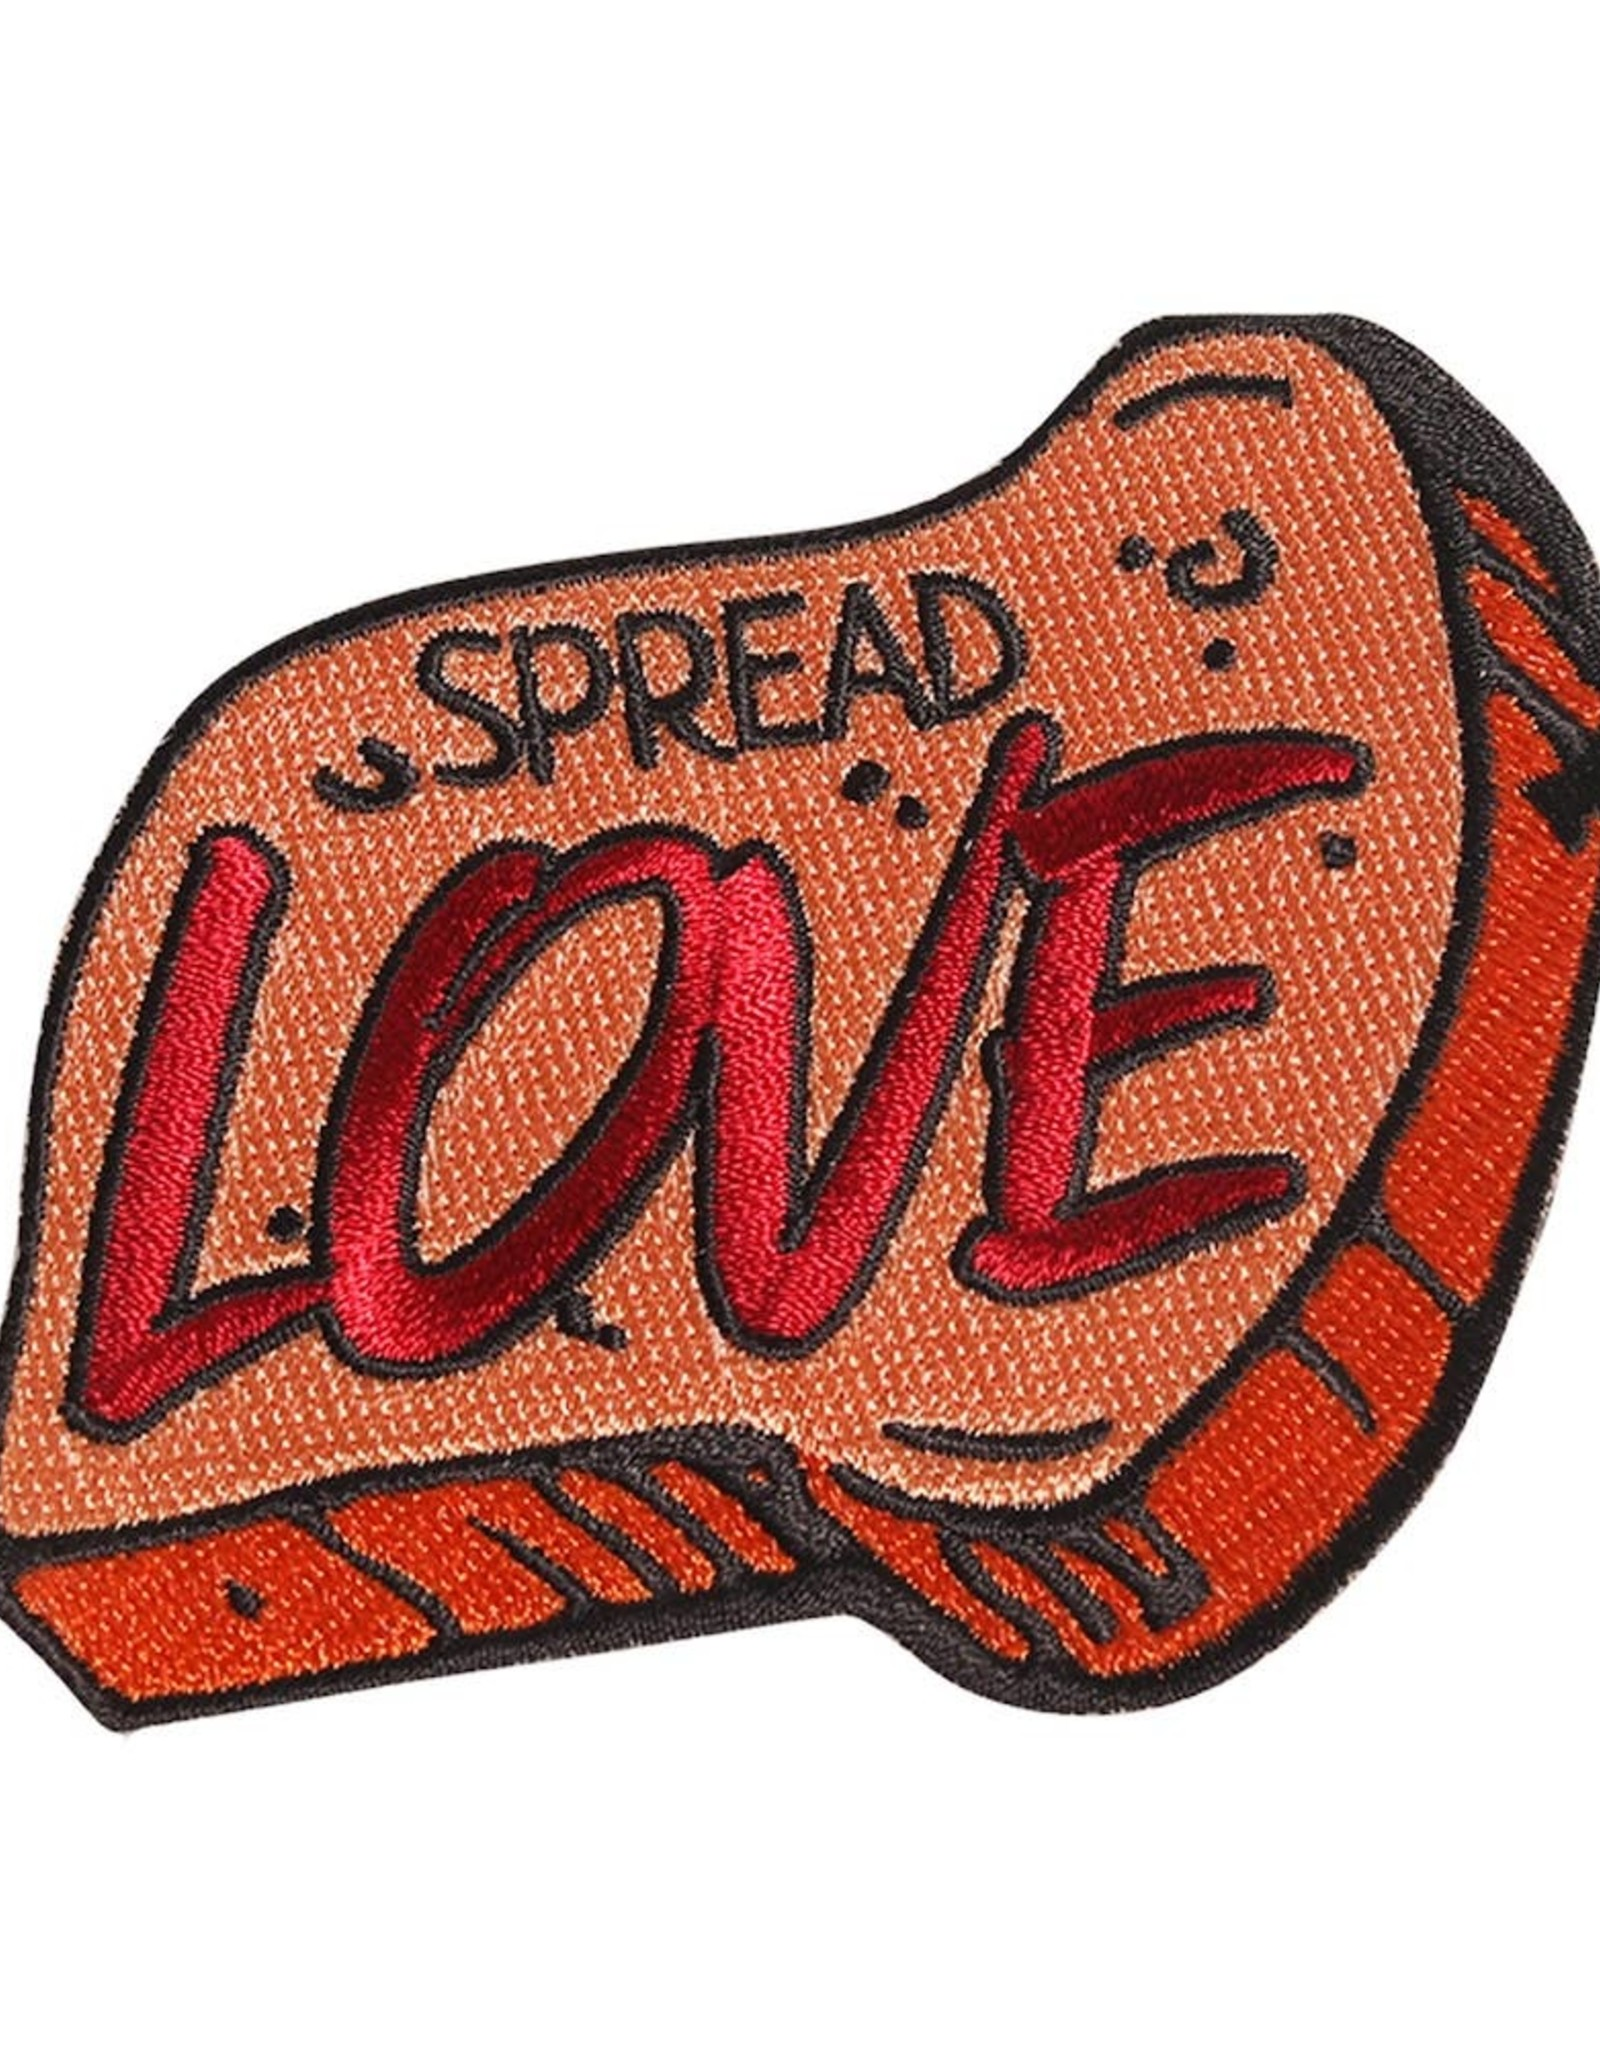 Patch: Spread Love Toast